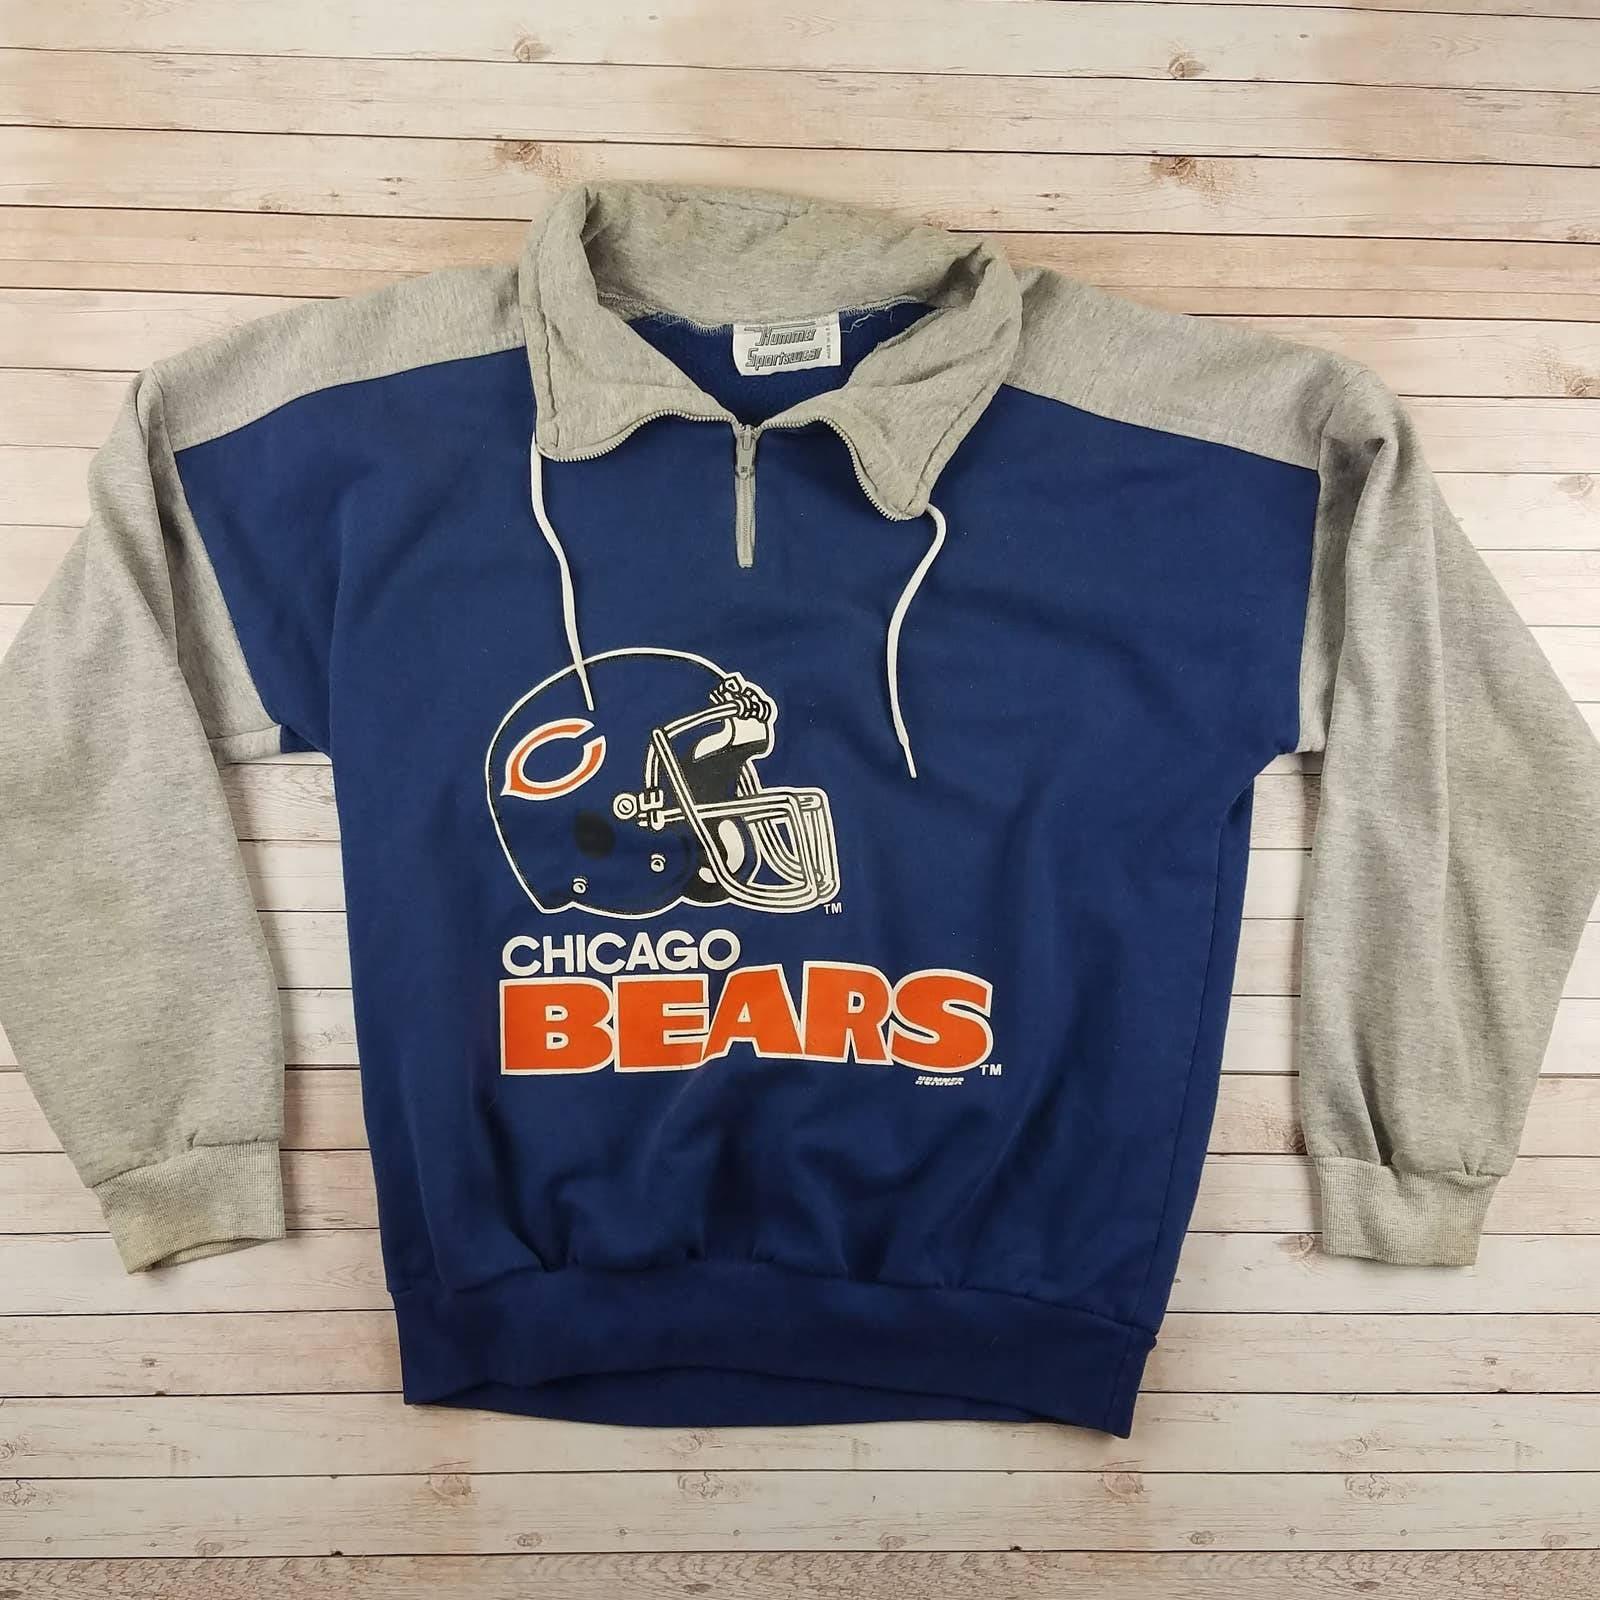 VTG 80s Chicago Bear Collared Sweatshirt